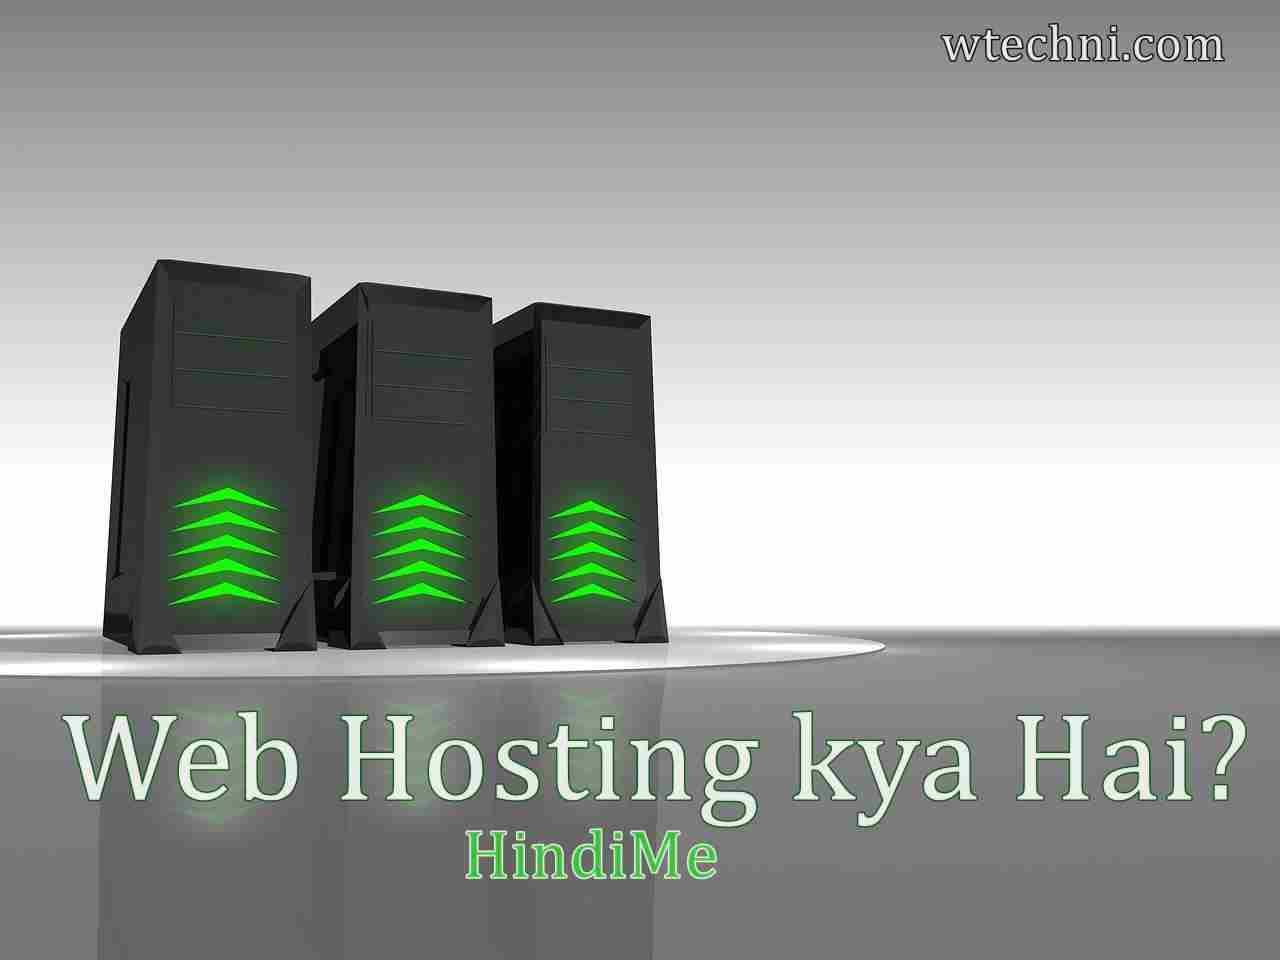 web hosting kya hai what is web hosting in hindi